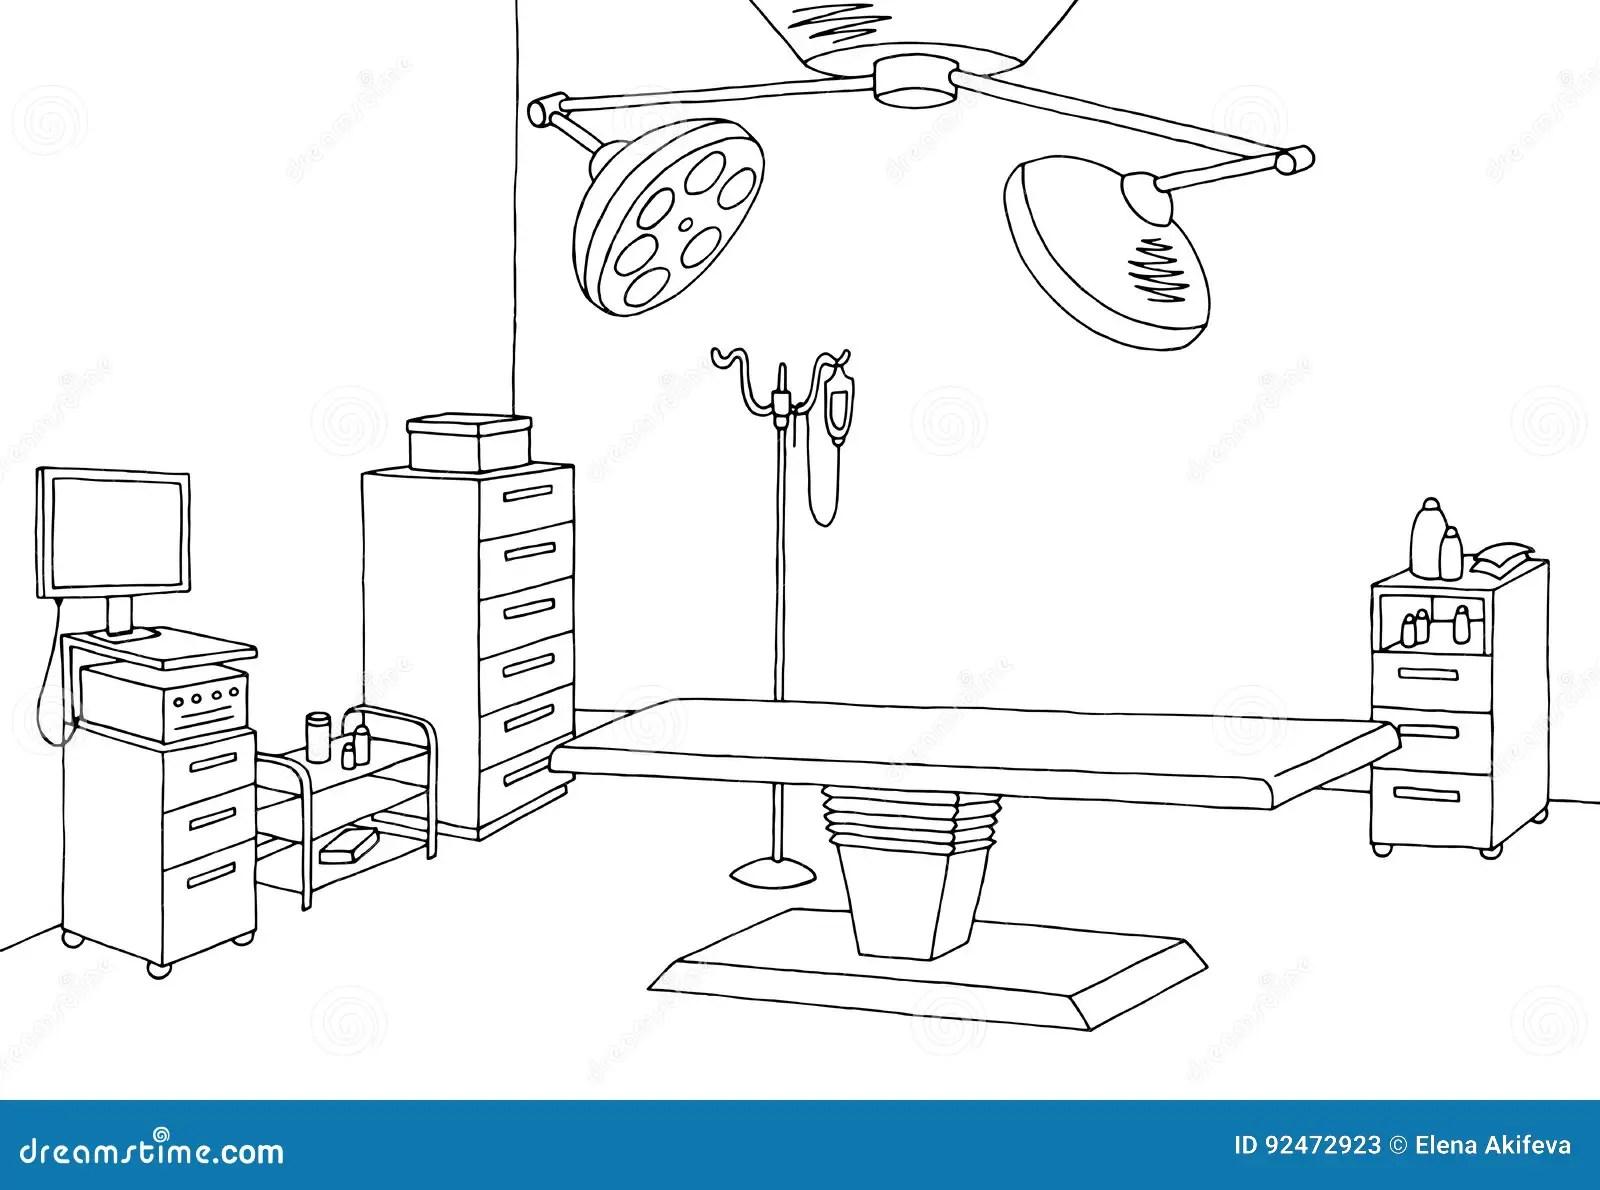 Operating Room Graphic Black White Interior Sketch